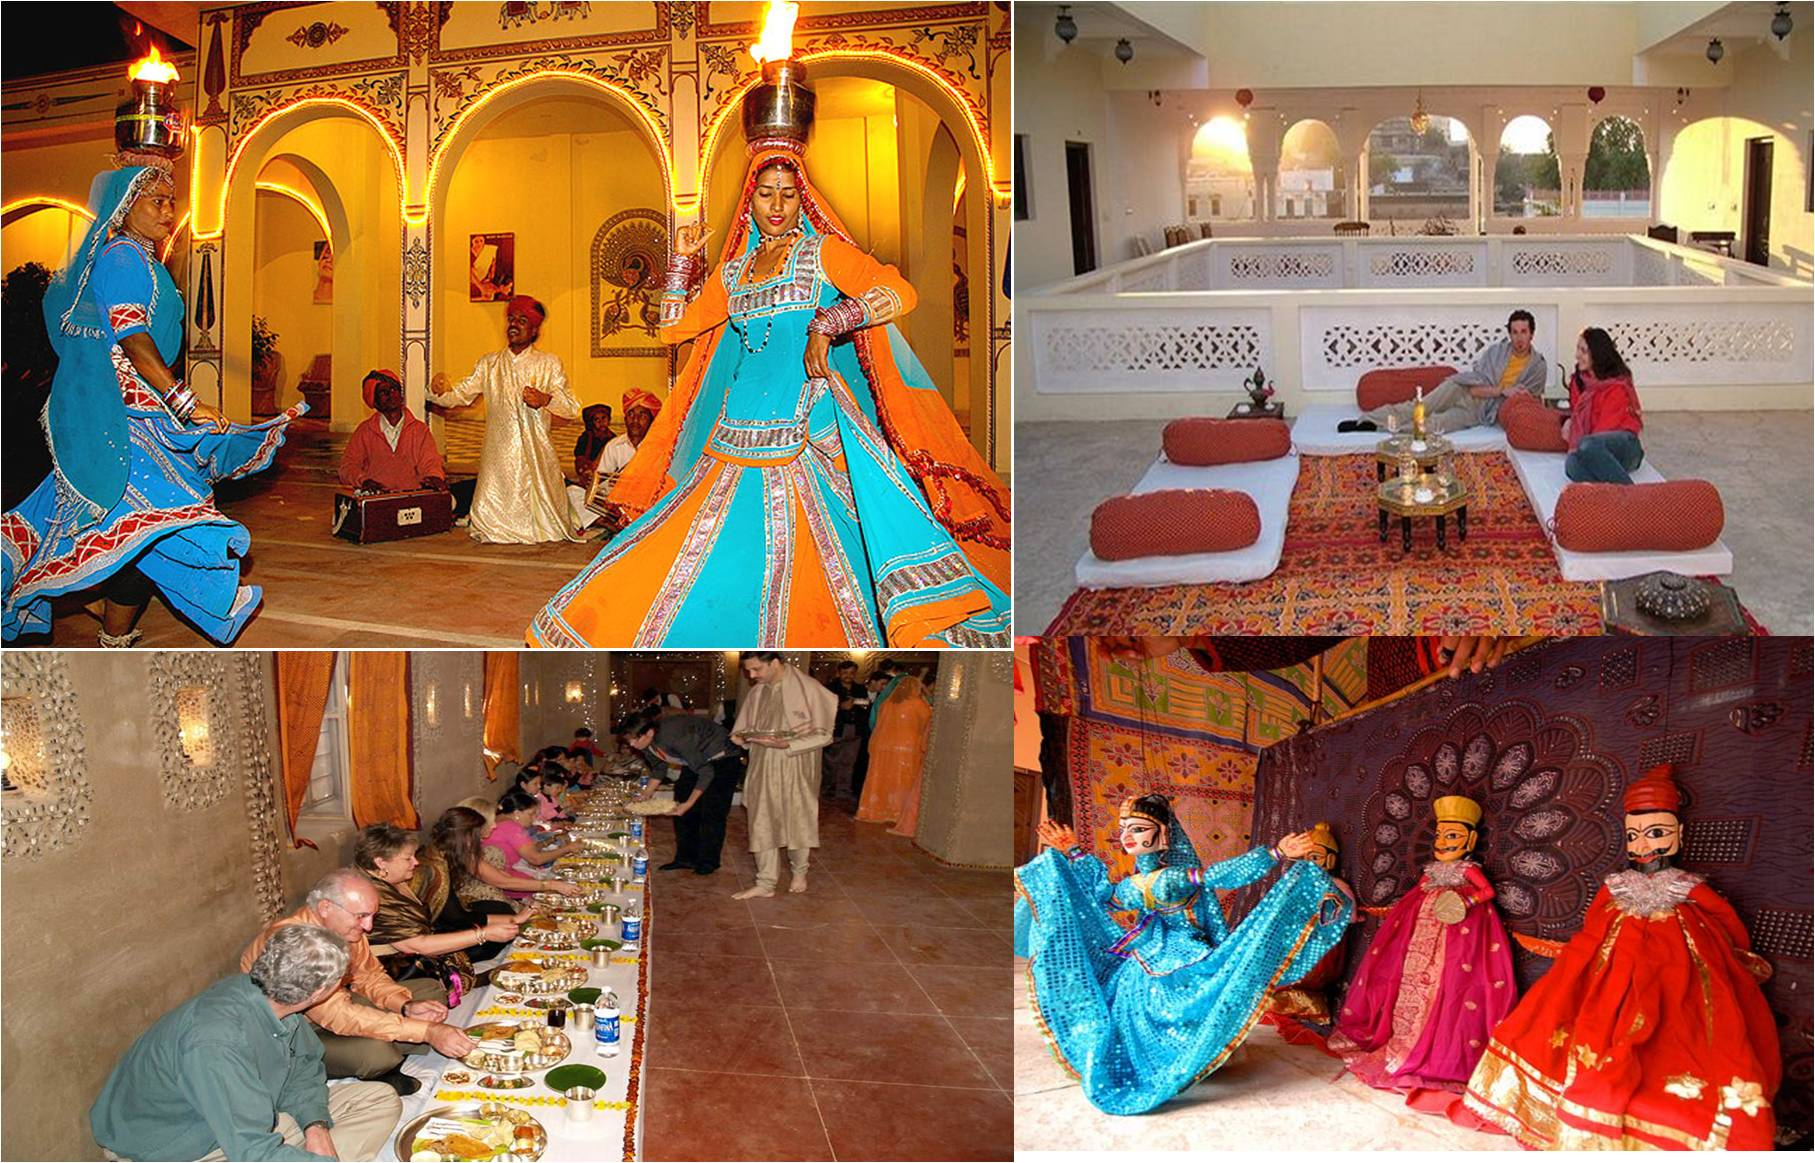 Royal-offbeat Destination Wedding Venues: Entertainment & Food